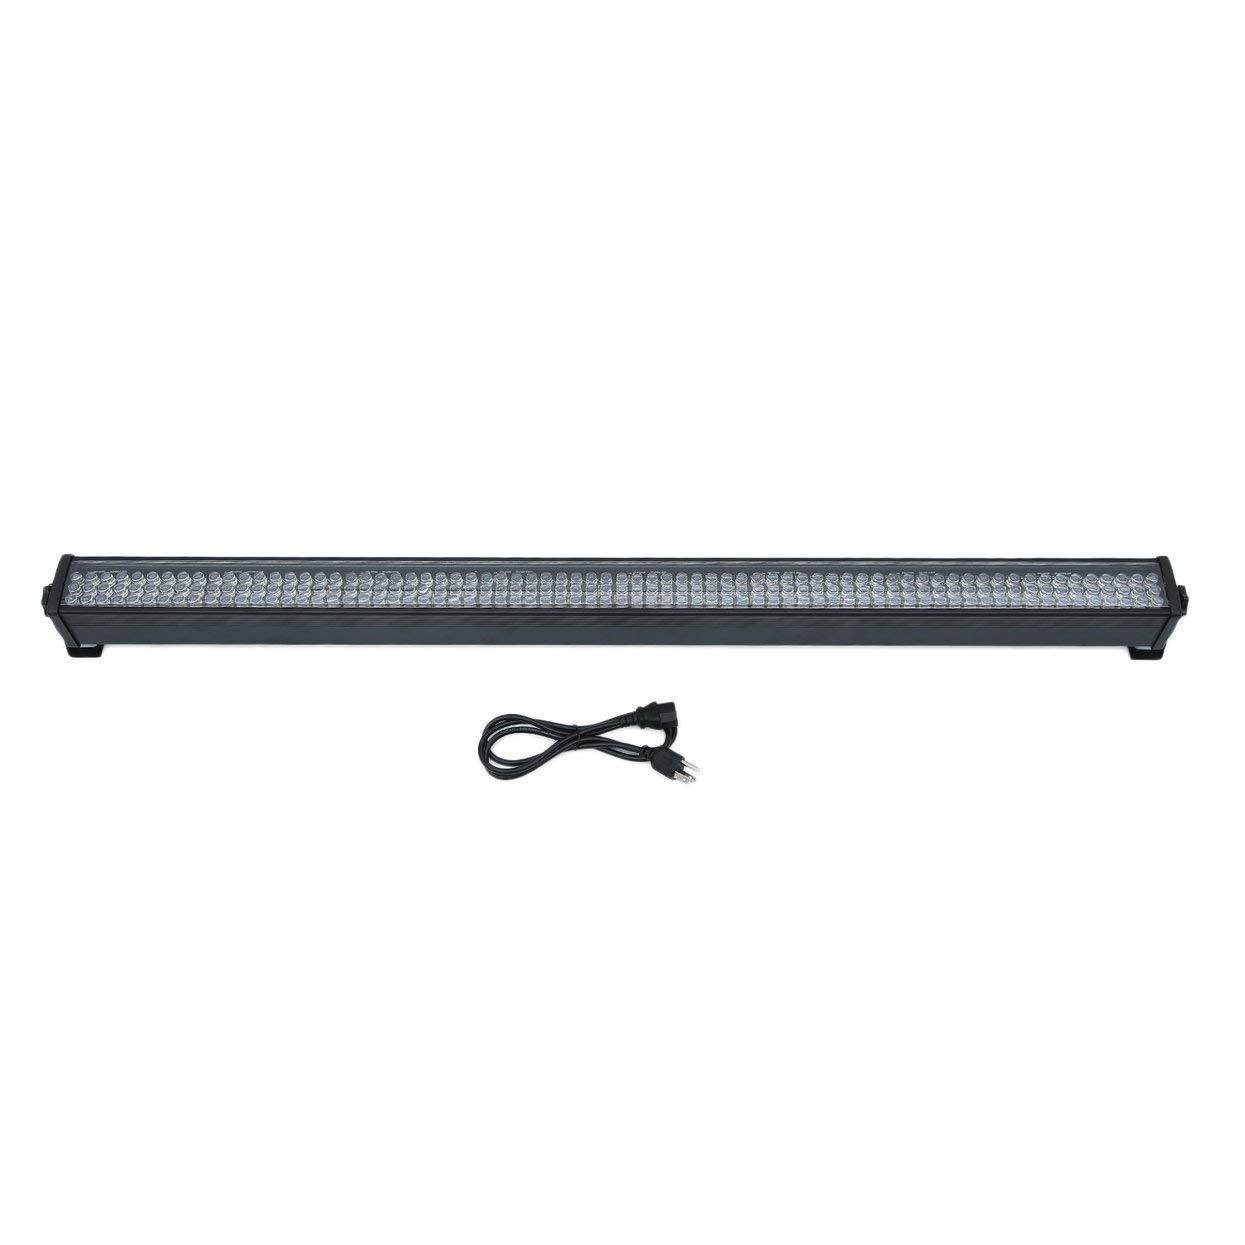 RGB Color Changing 216 LED Landscape Light Linear Bar Lamp DMX 512 6/24CH Wall Washer Lighting Bar 28W AC110-240V